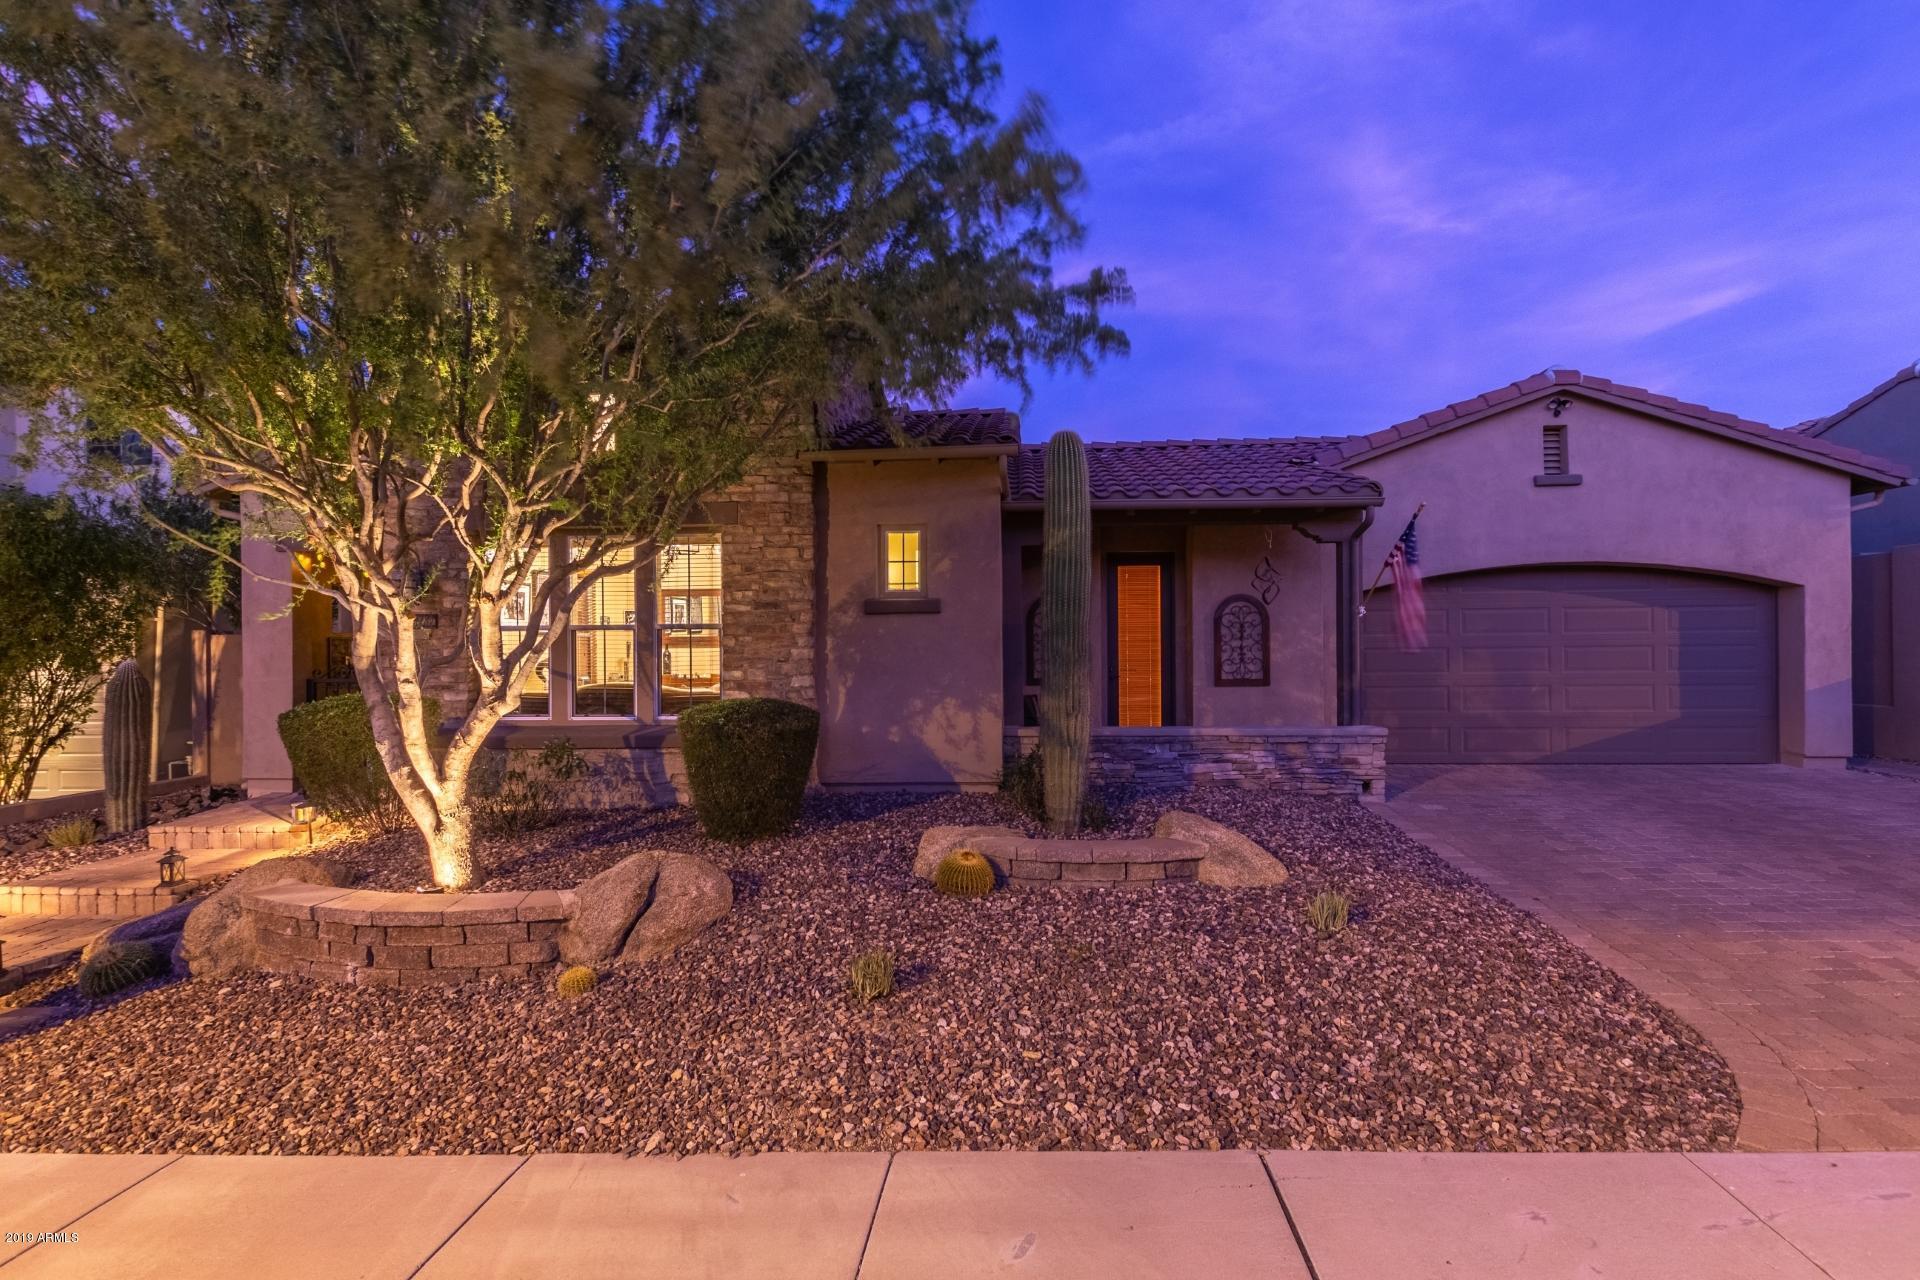 MLS 5971089 28737 N 68th Drive, Peoria, AZ 85383 Peoria AZ Sonoran Mountain Ranch